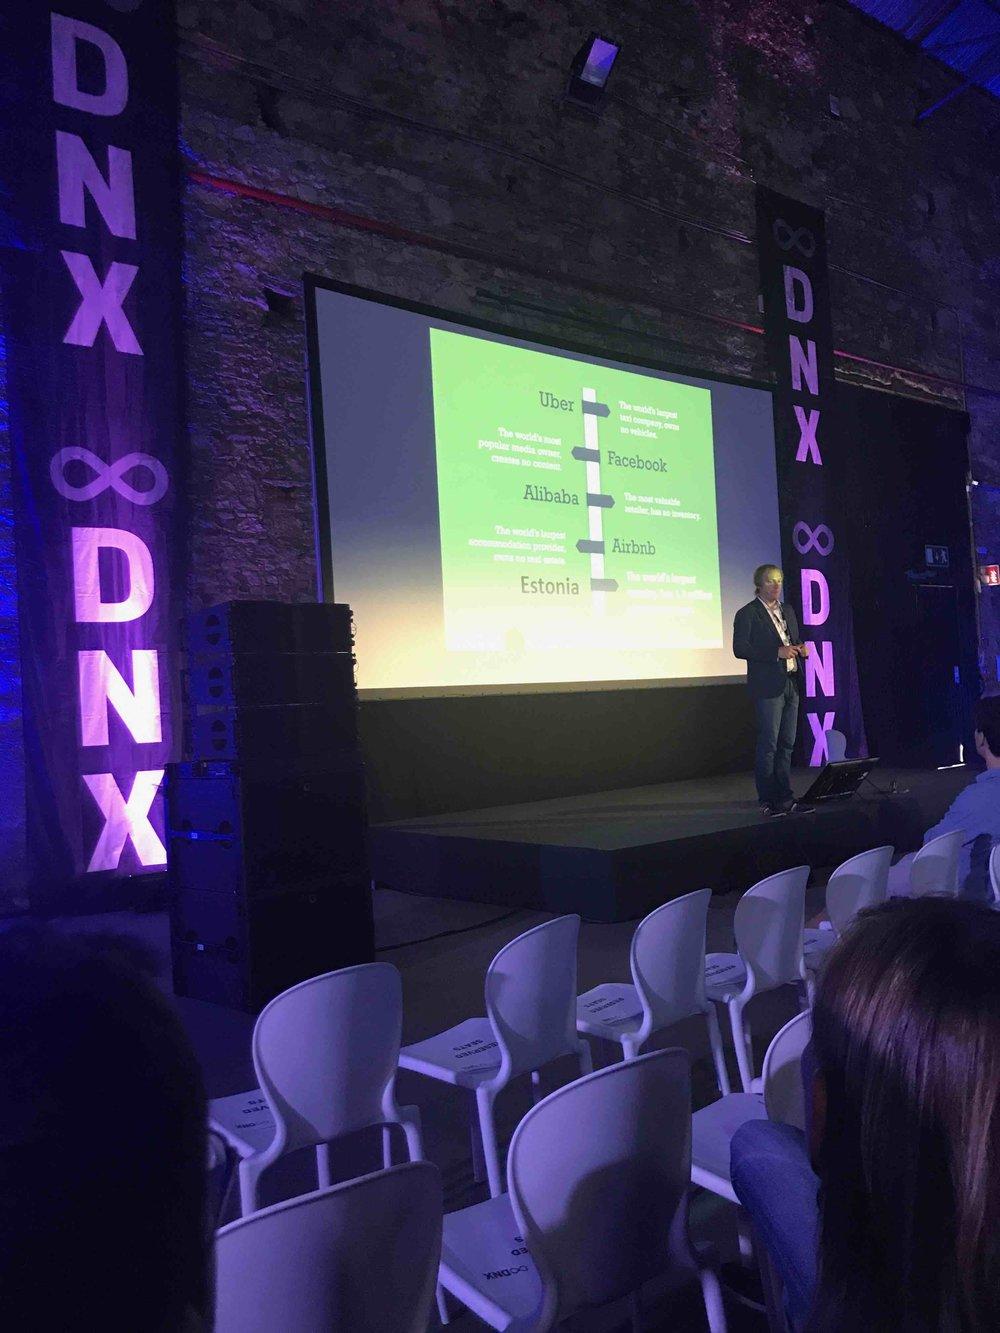 #digitalnomad #disawistories #digitalezukunft #dnxlisbon #lxfactory #portugal #taavikotka #ecitizenship.jpg